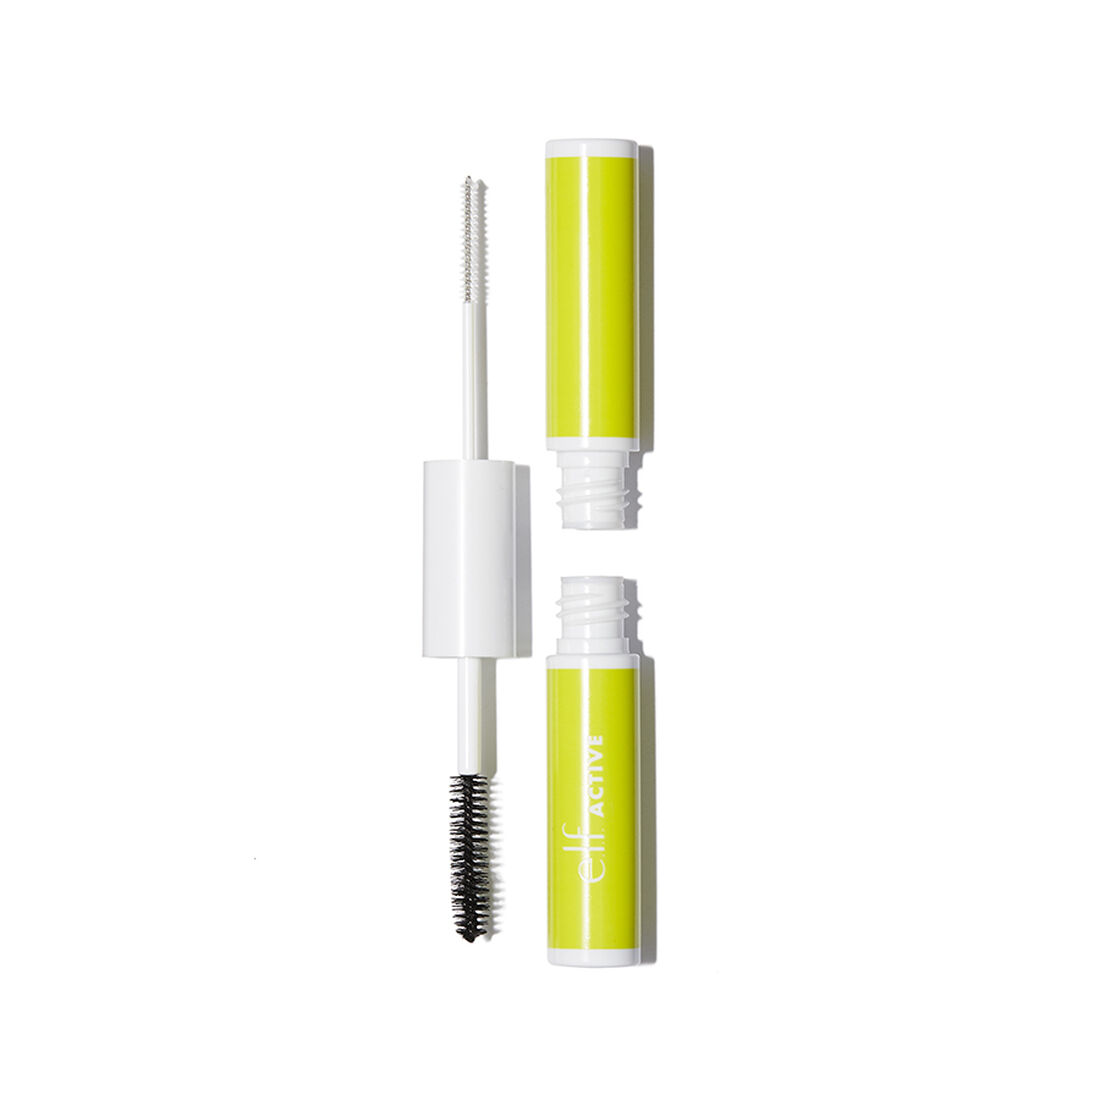 ELF Cosmetics - Sweat Resistant Mascara & Brow Duo